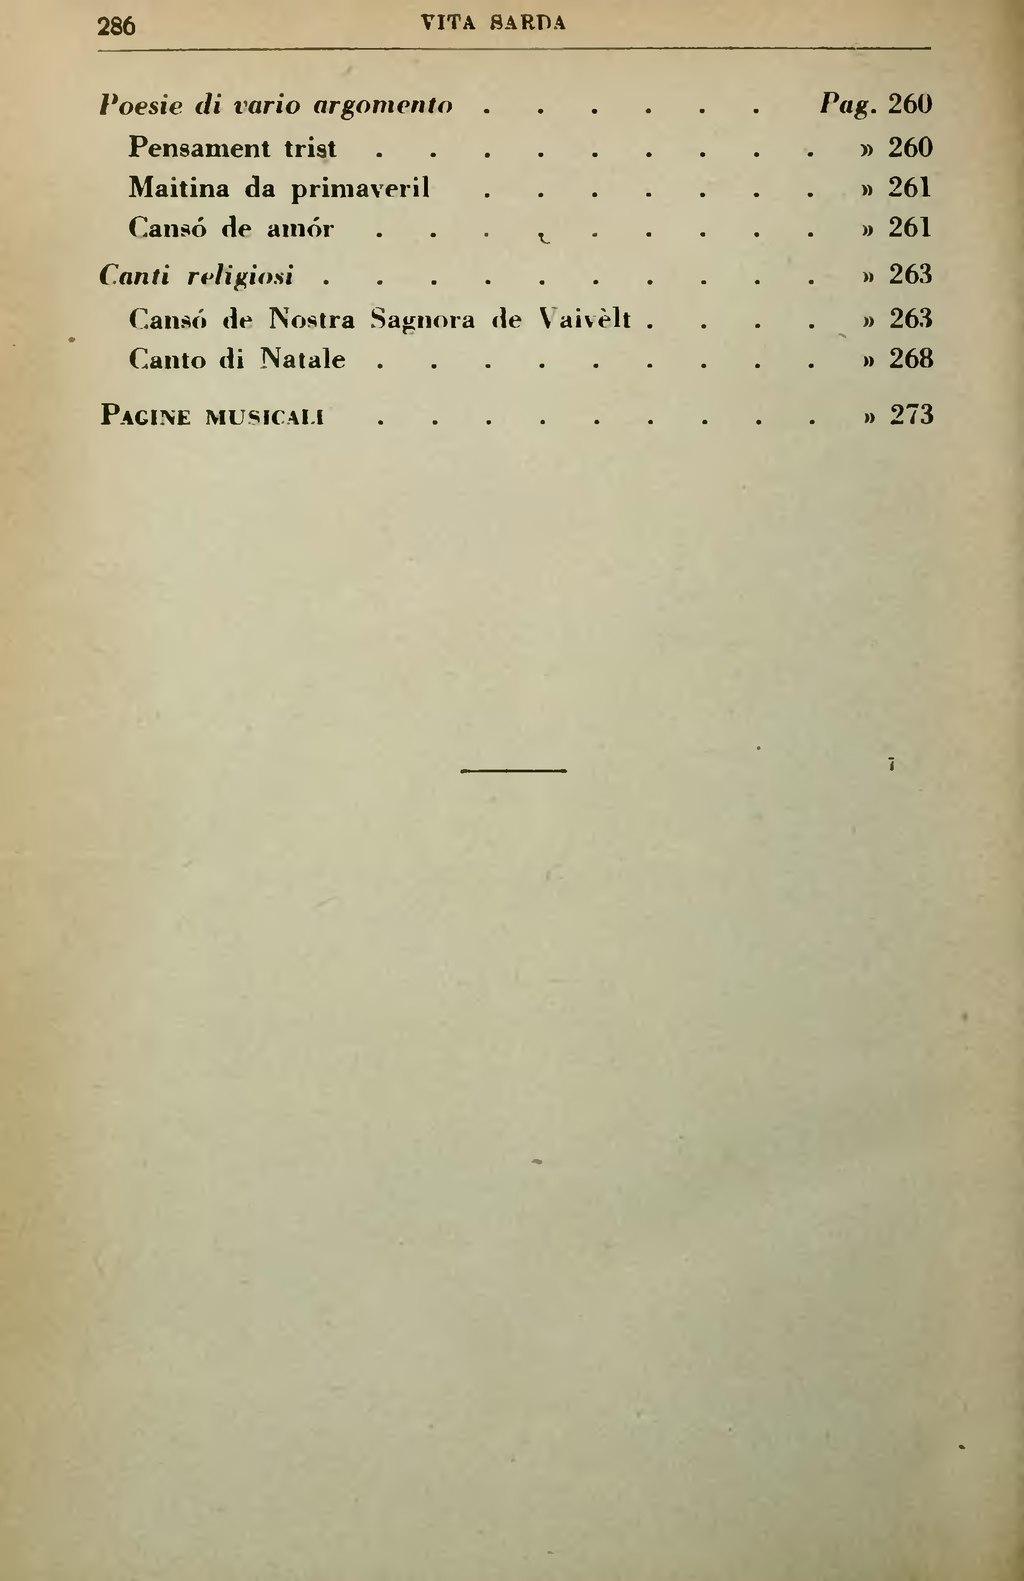 Poesie Di Natale In Sardo.Pagina Vita Sarda Note Di Folklore Canti E Leggende 1887